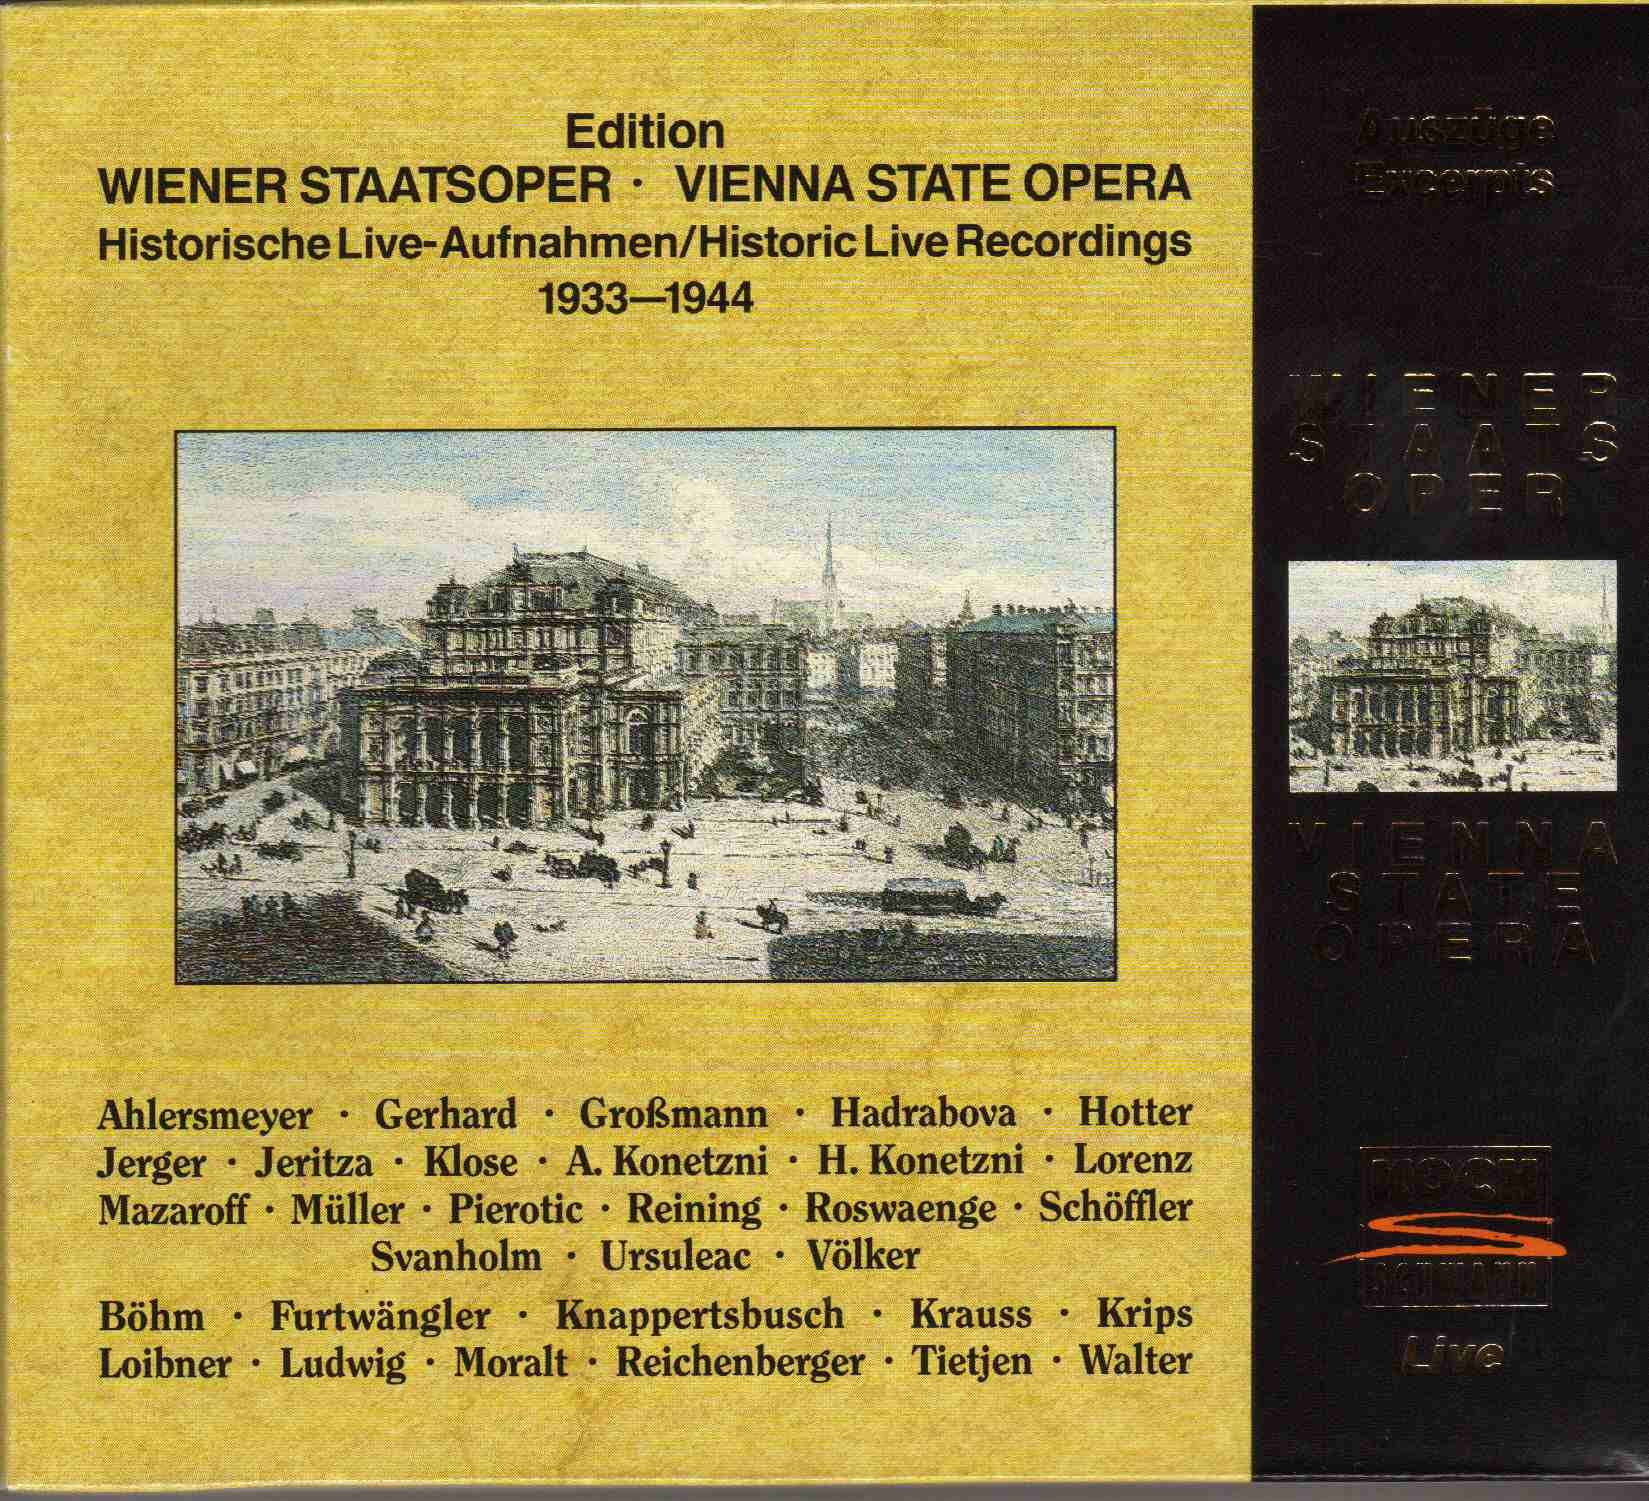 Historic Live Recordings 1933-1944